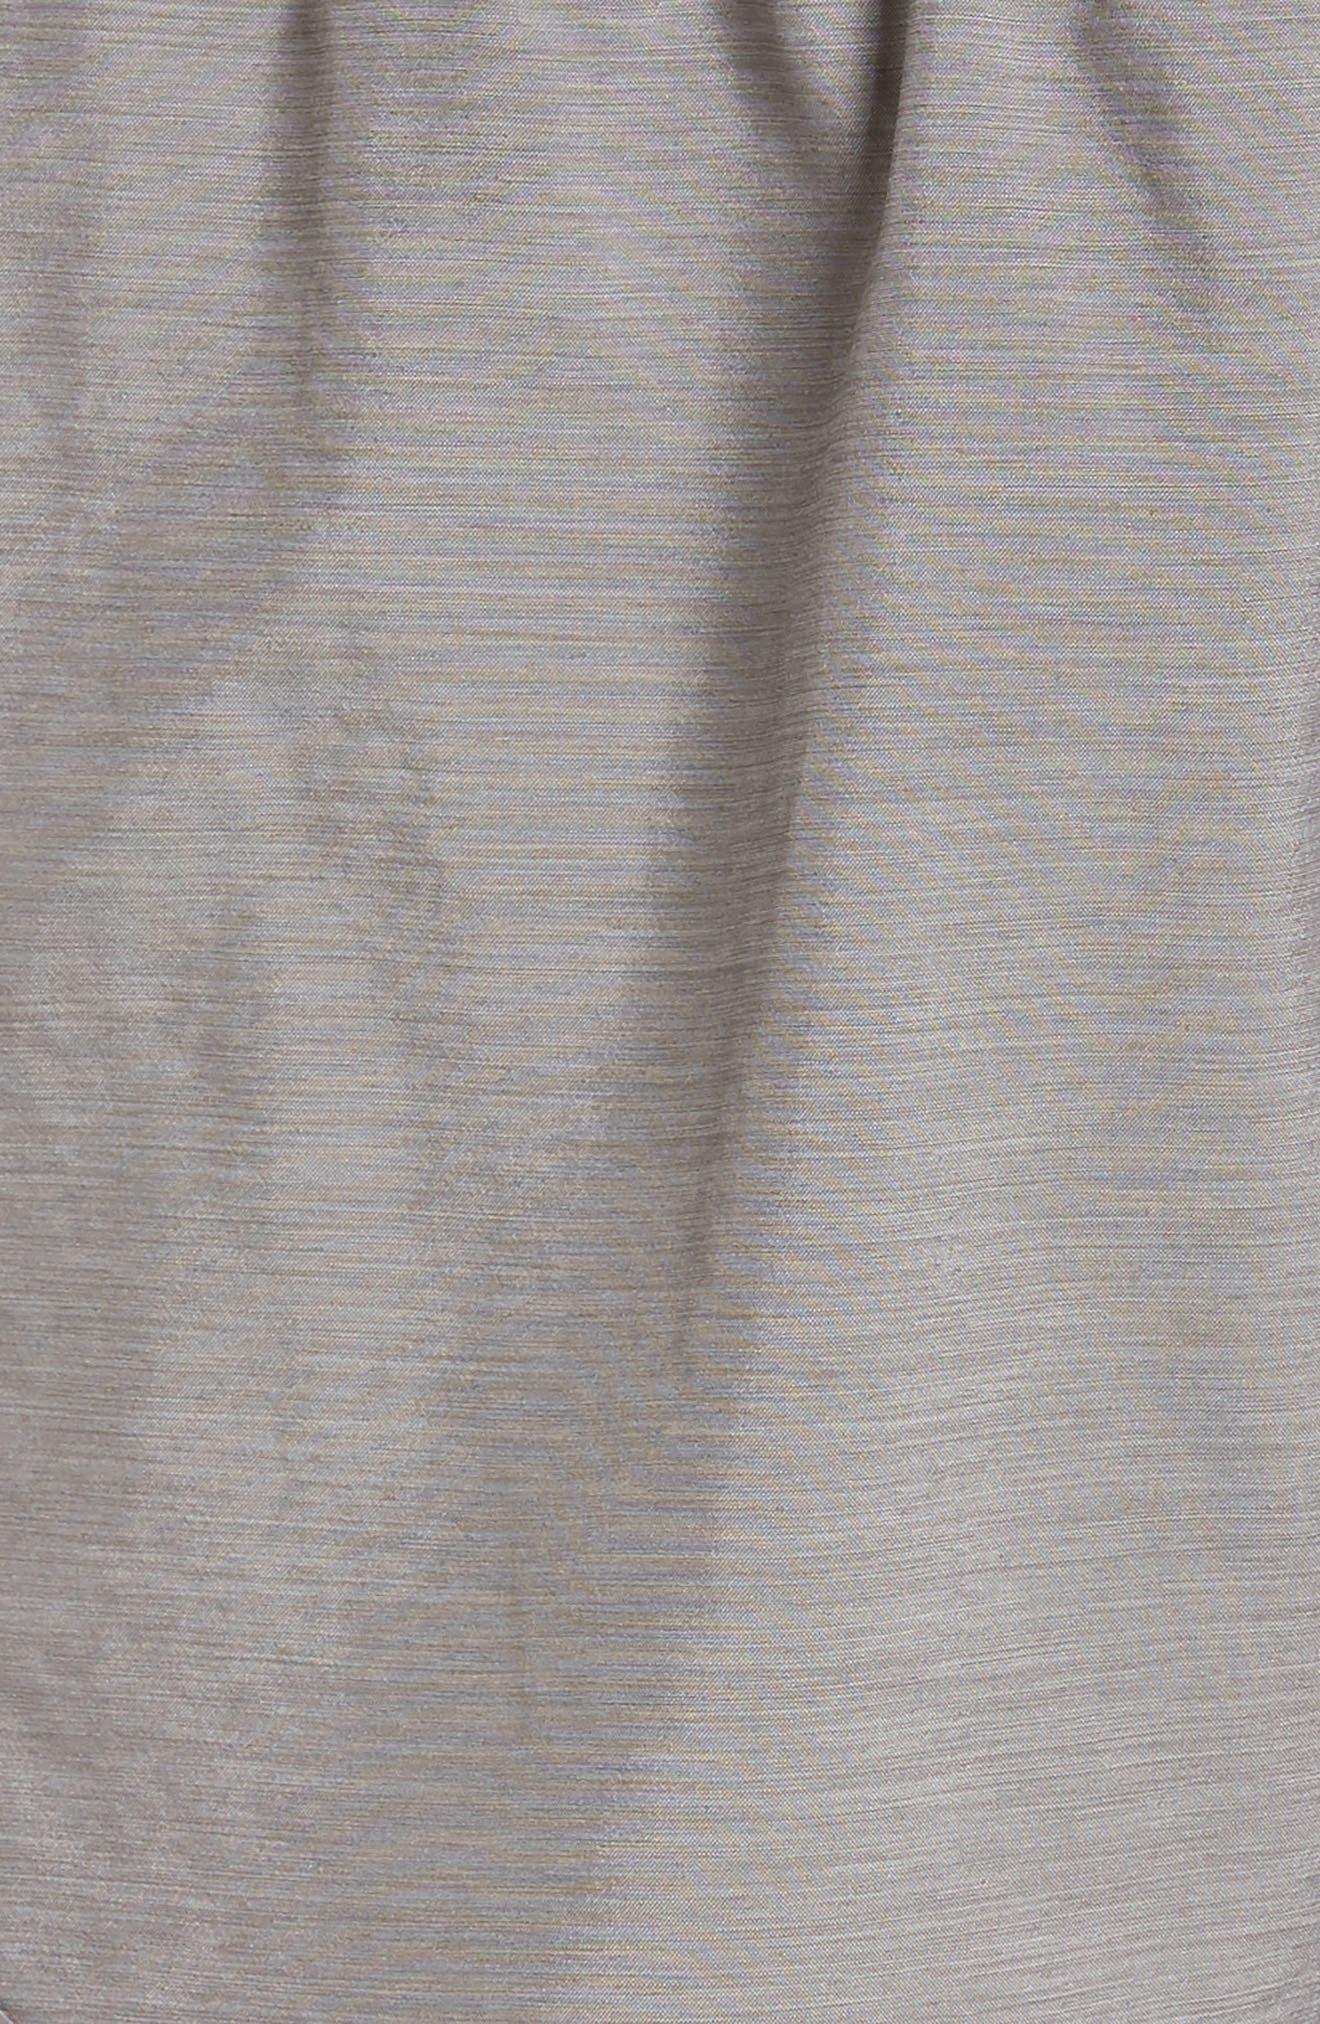 NIKE, Dry Tempo Running Shorts, Alternate thumbnail 6, color, GUNSMOKE/ WOLF GREY